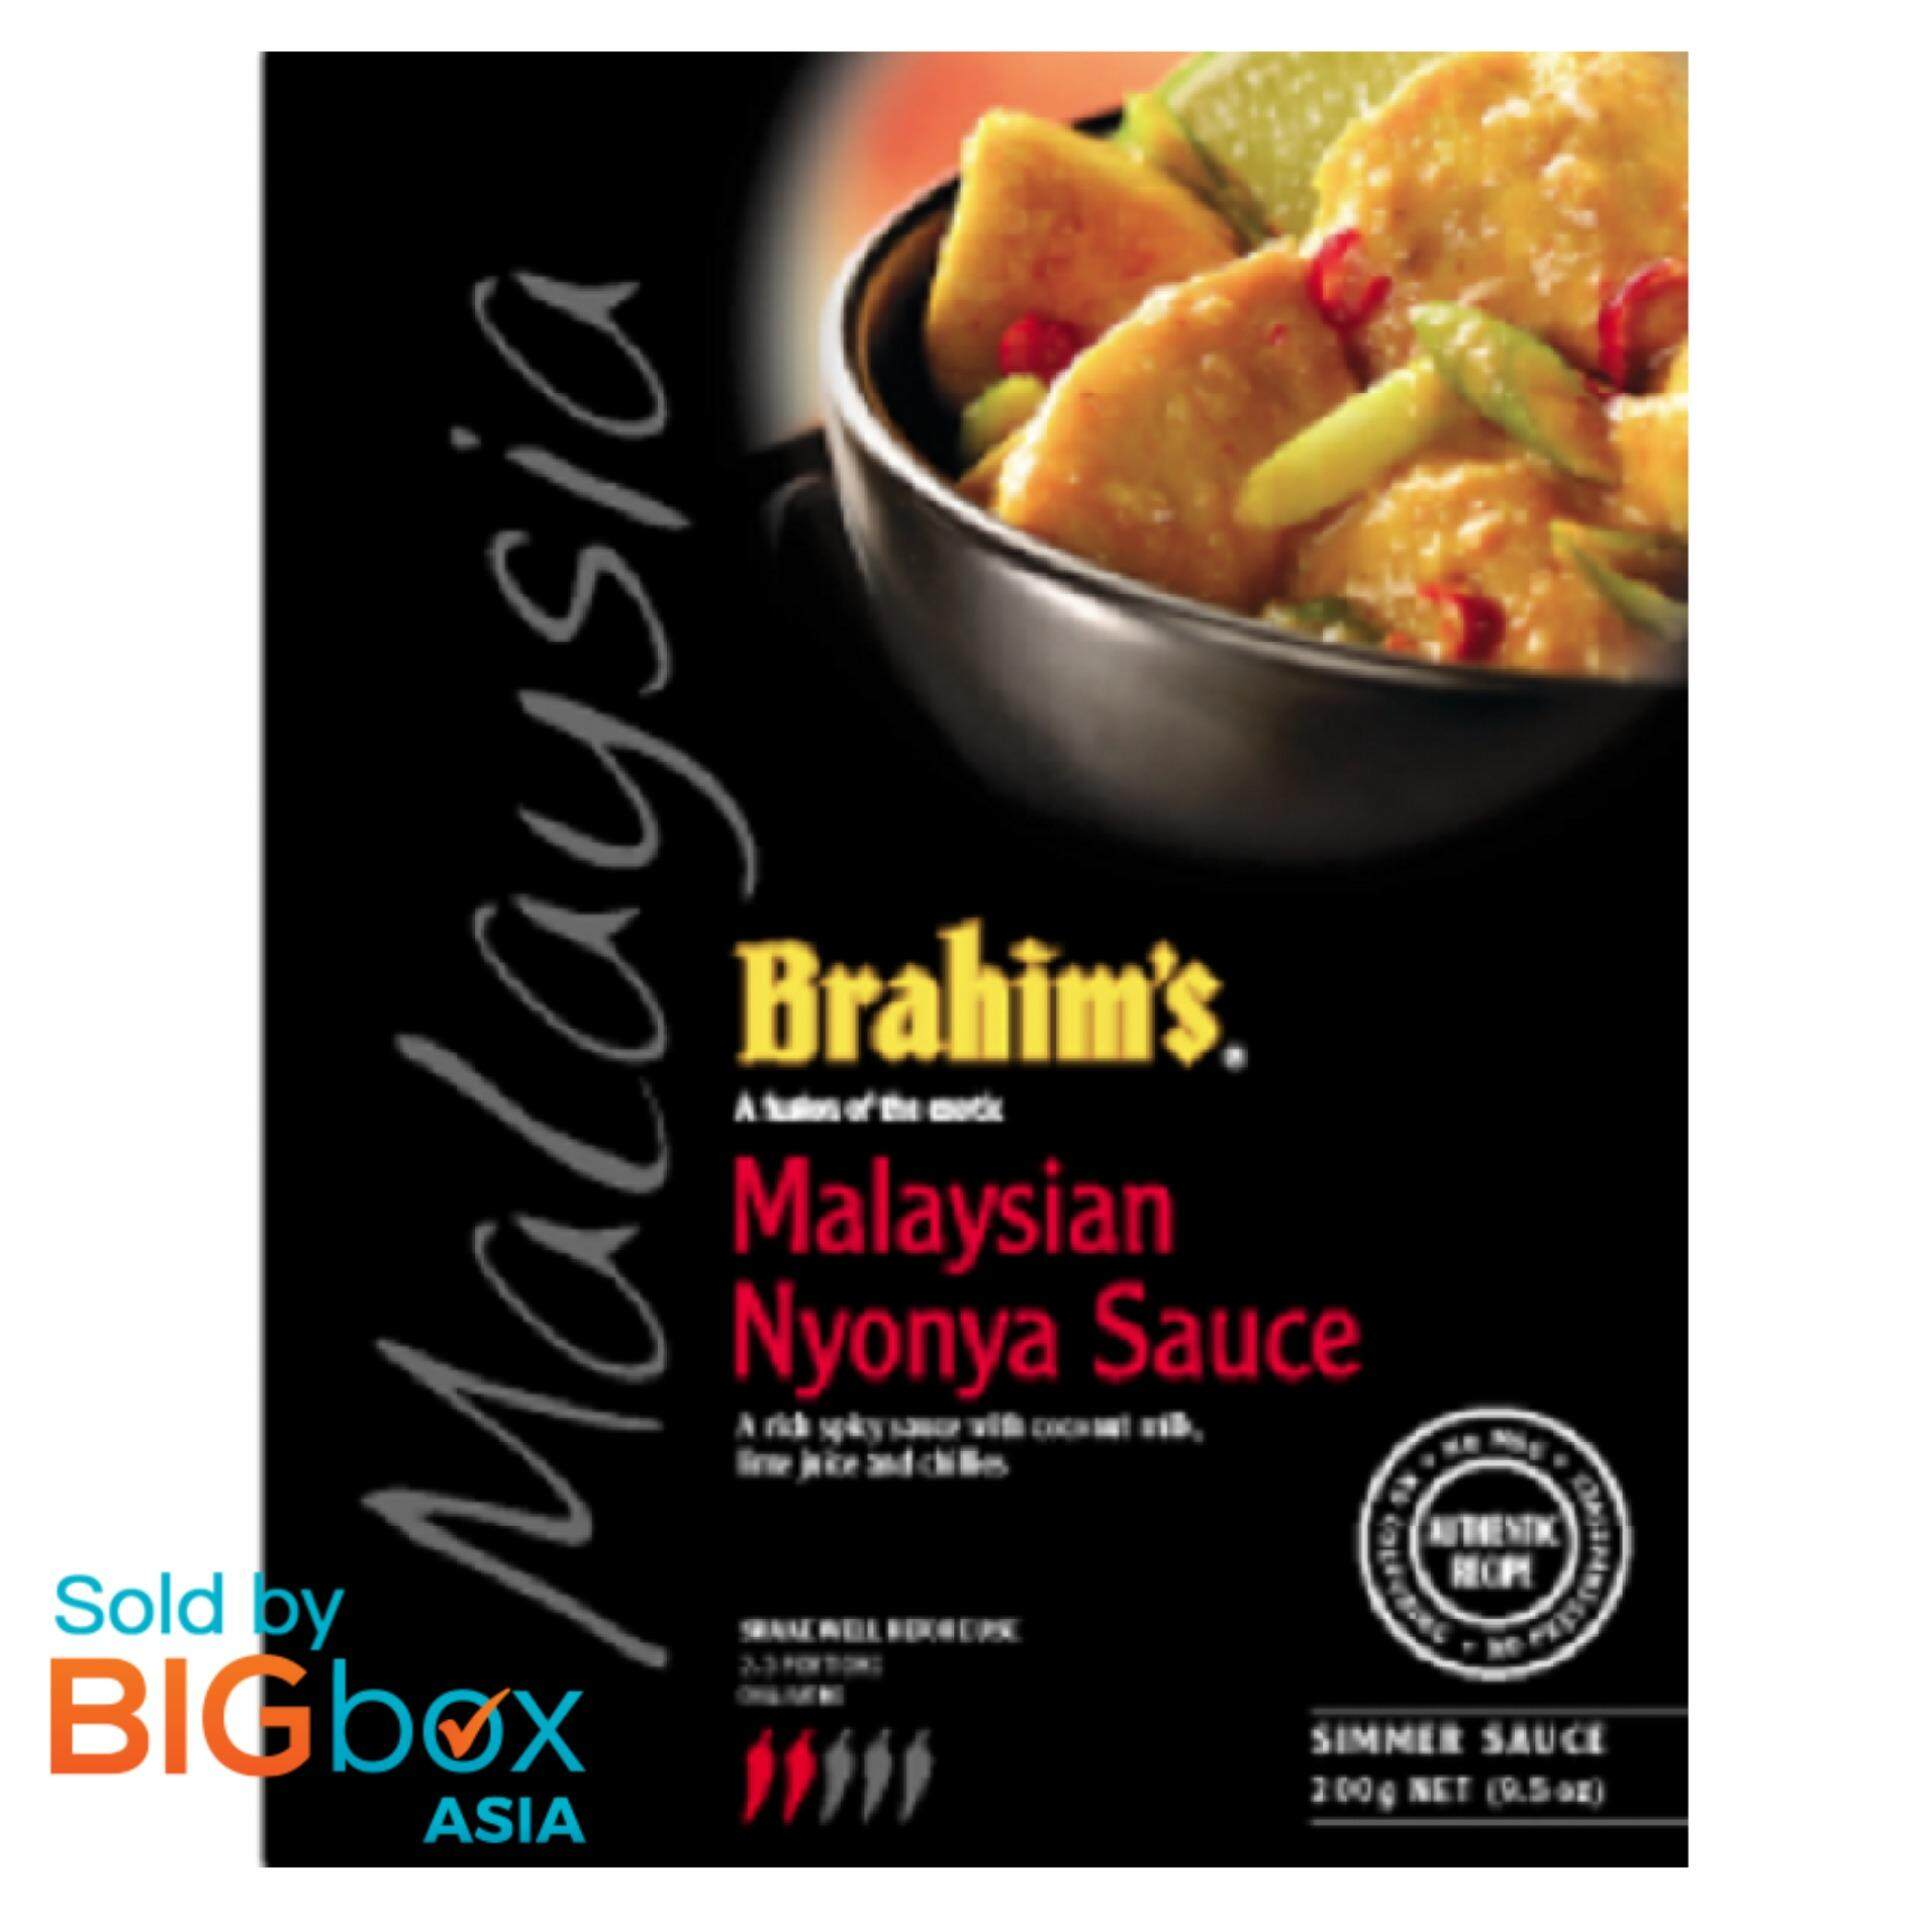 [BIGBox Asia] Brahims Nyonya Simmer Sauce/Kuah Nyonya 300g - Malaysia